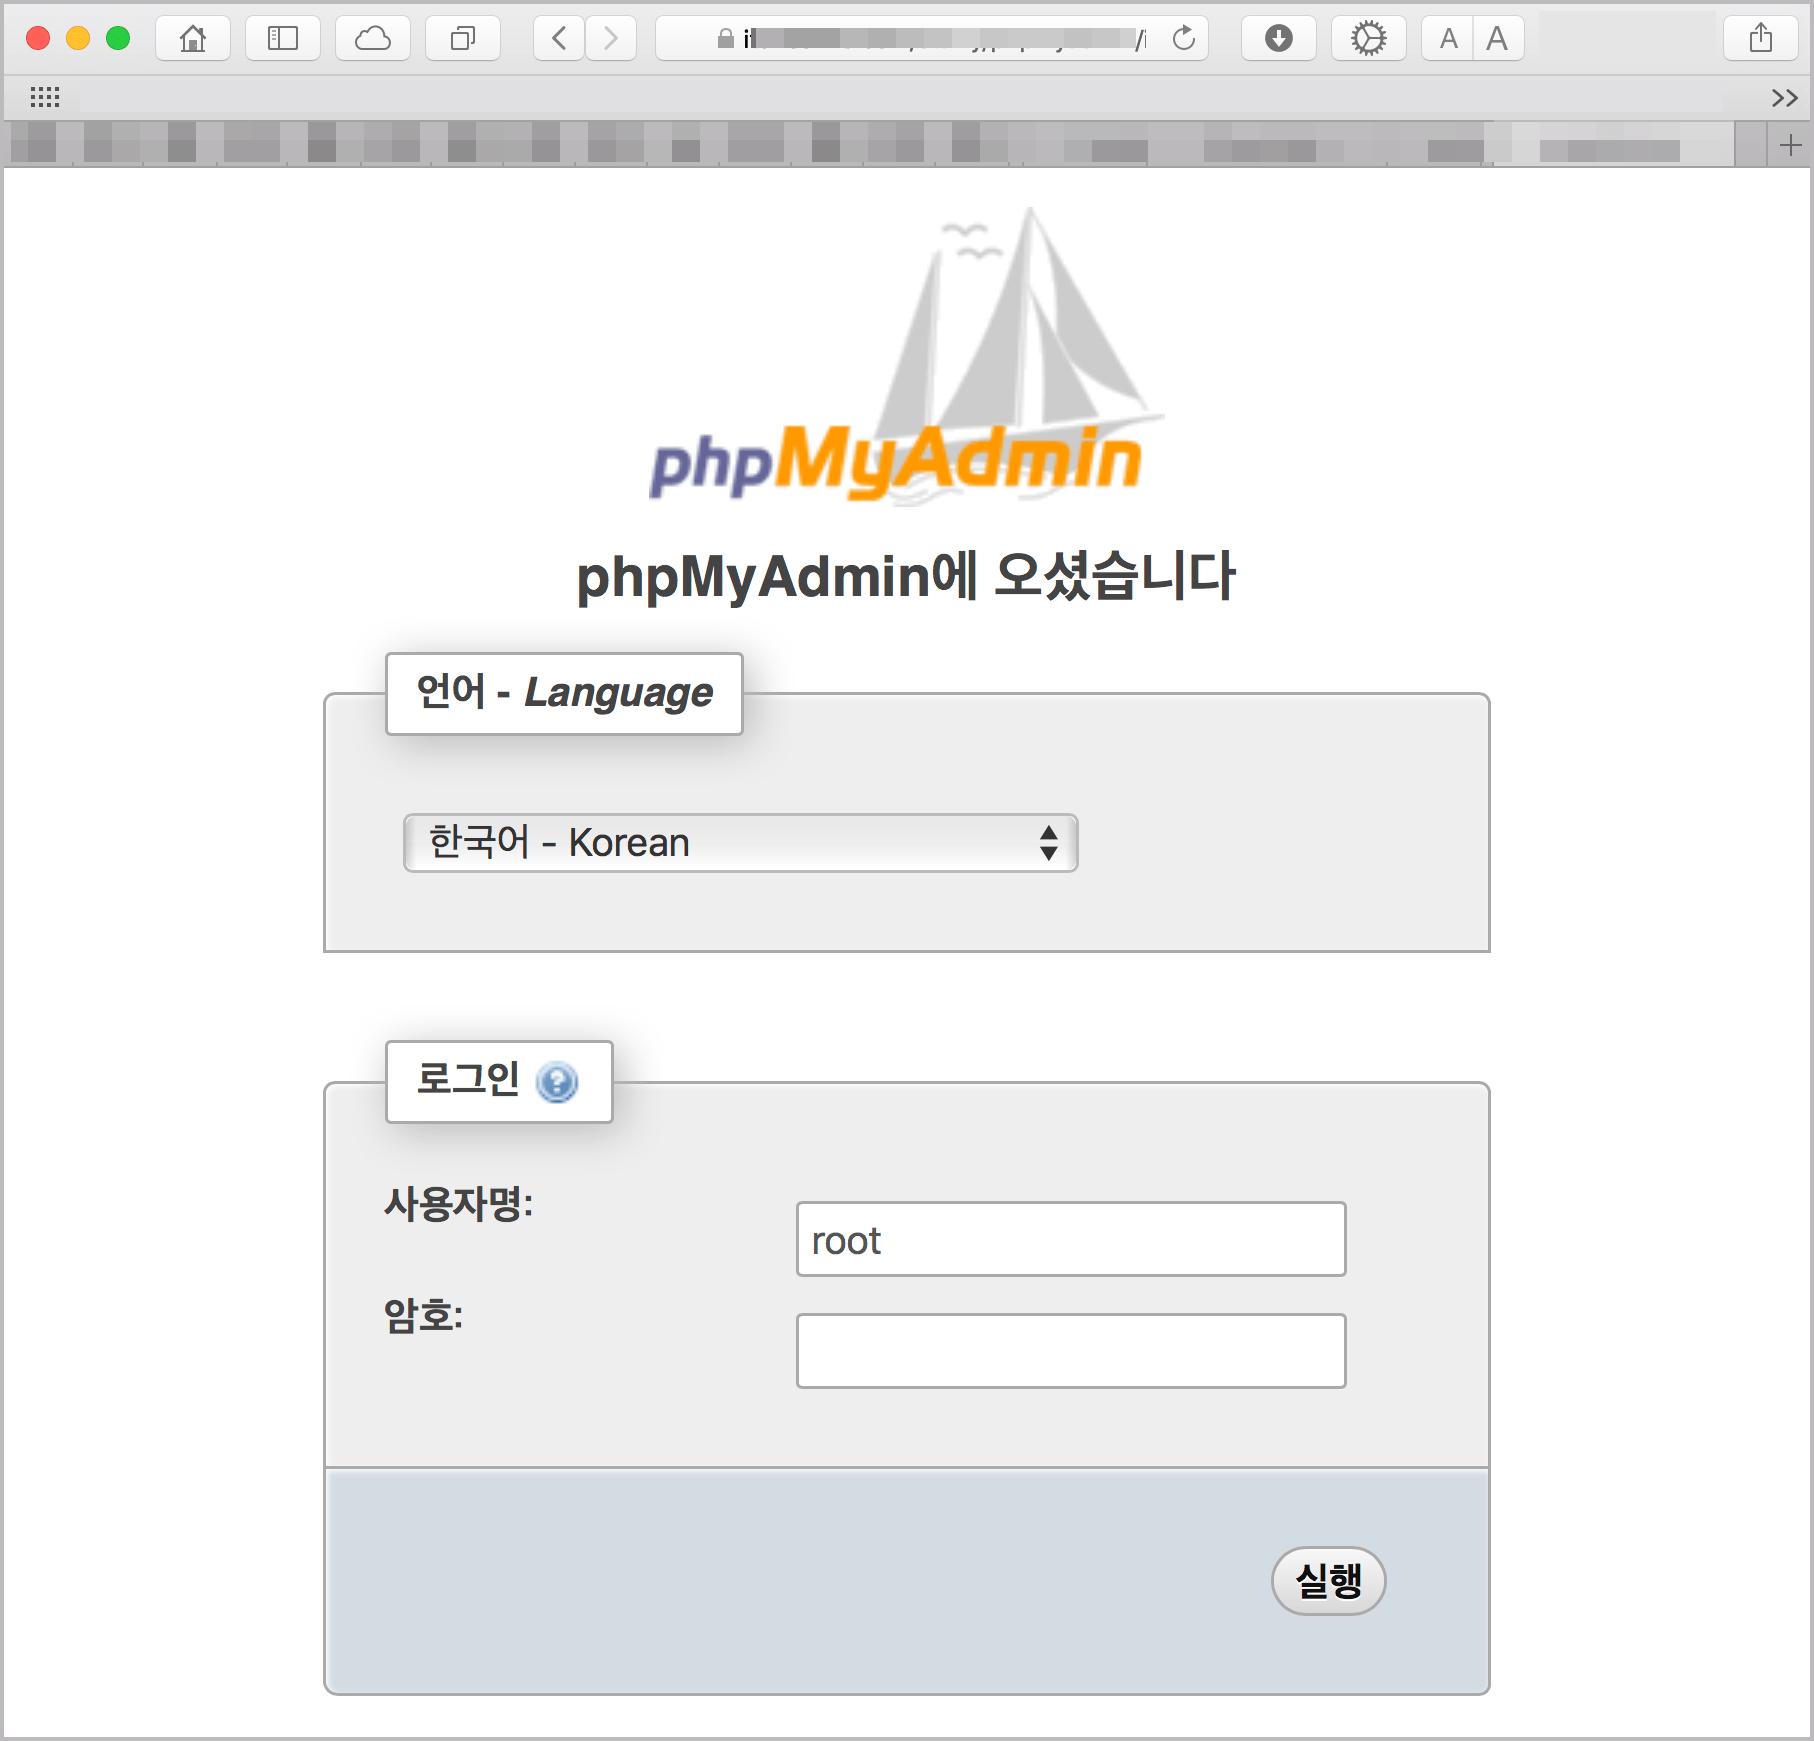 phpMyAdmin 로그인 페이지